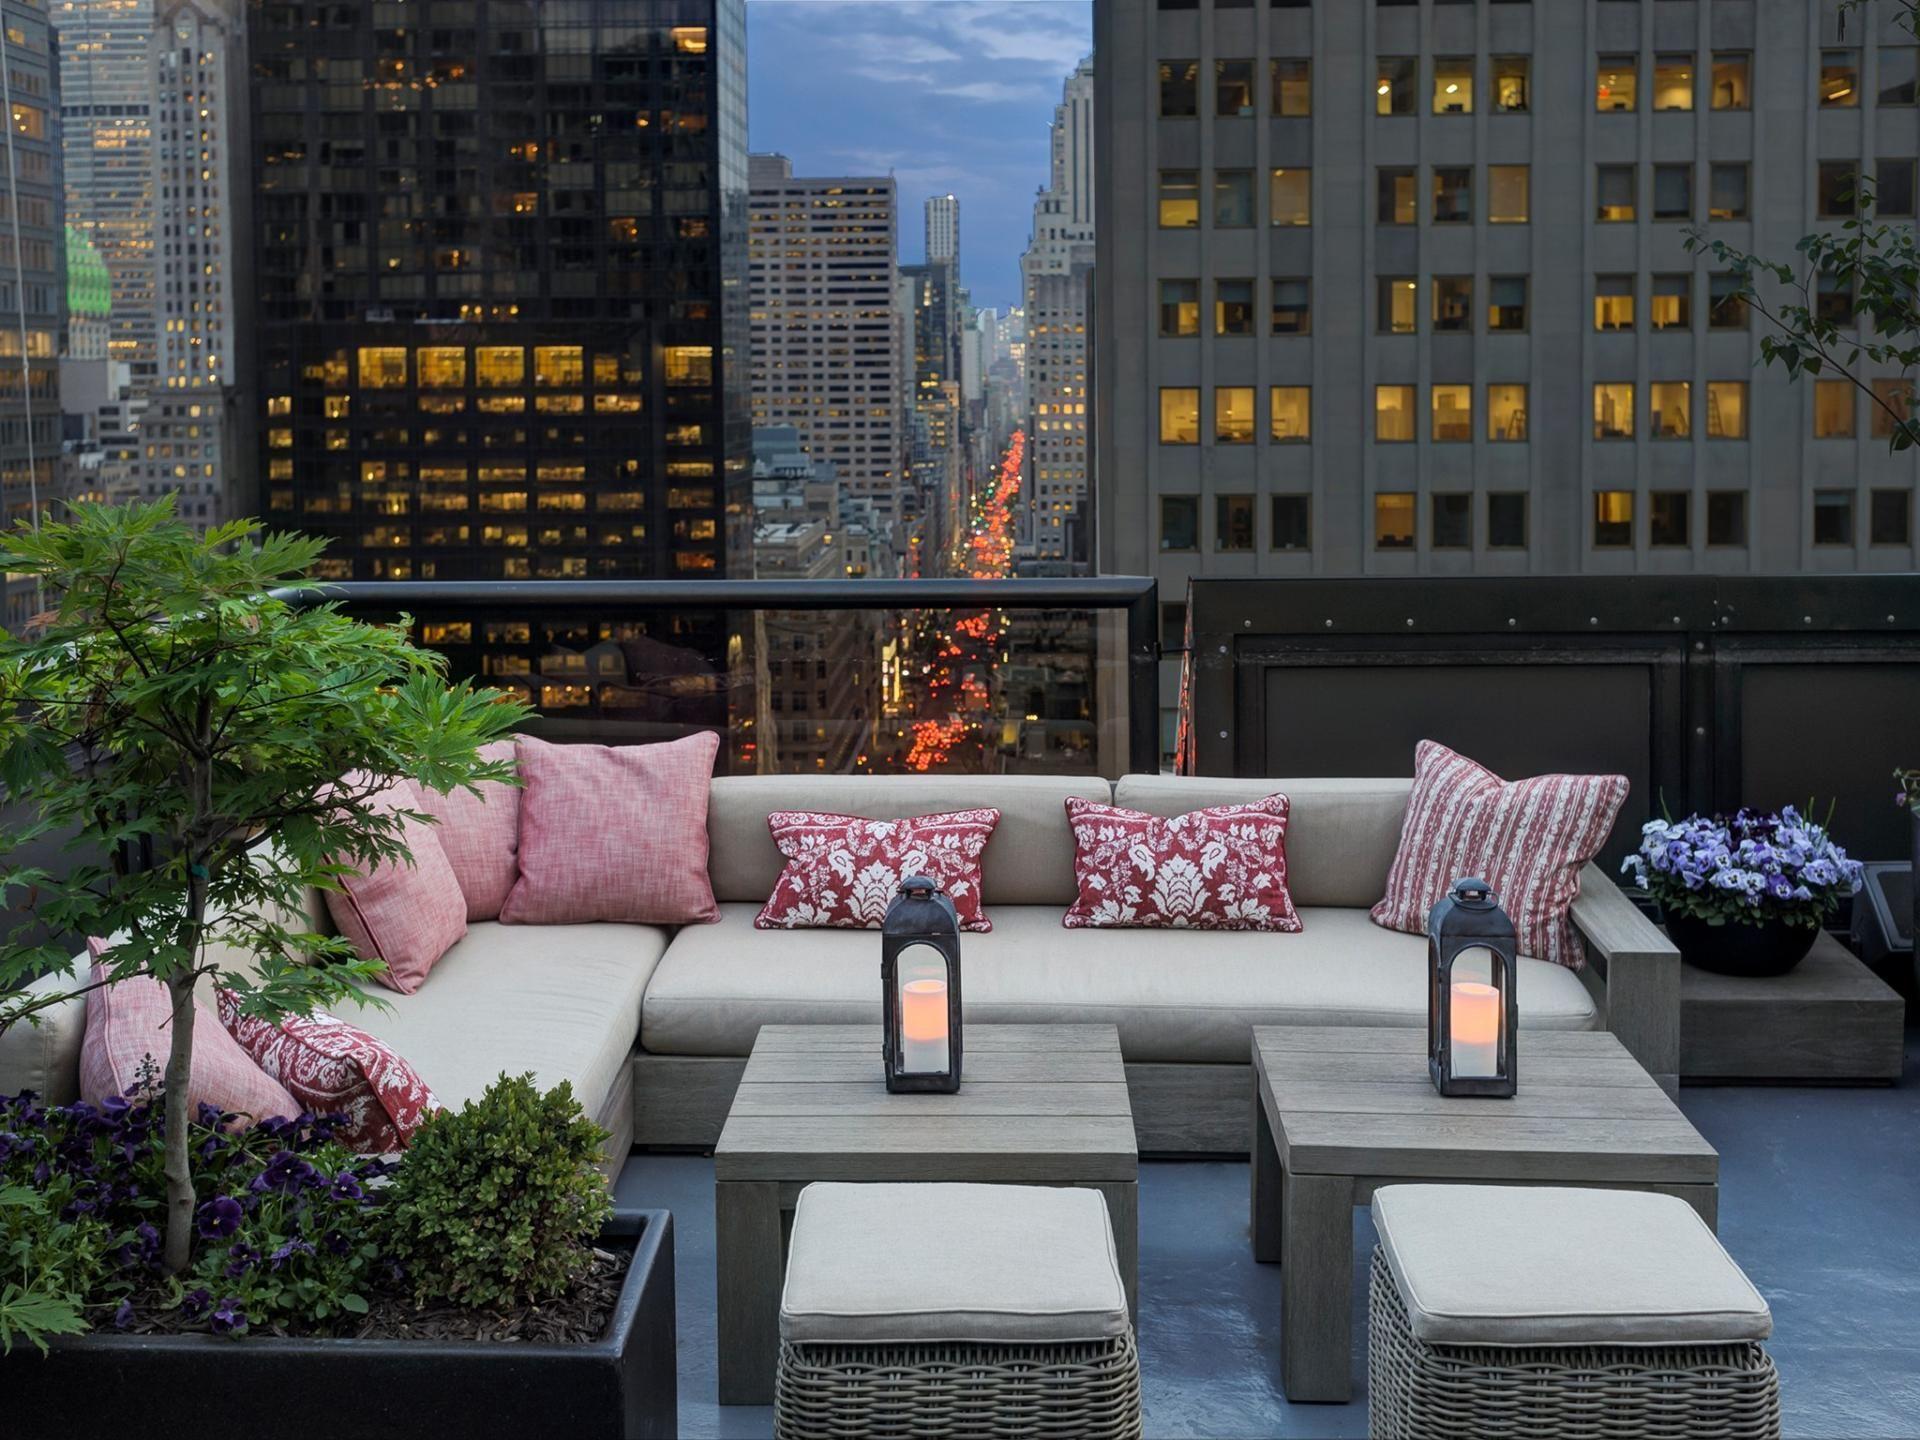 Salon De Ning Rooftop Bar At The Peninsula Hotel New York City